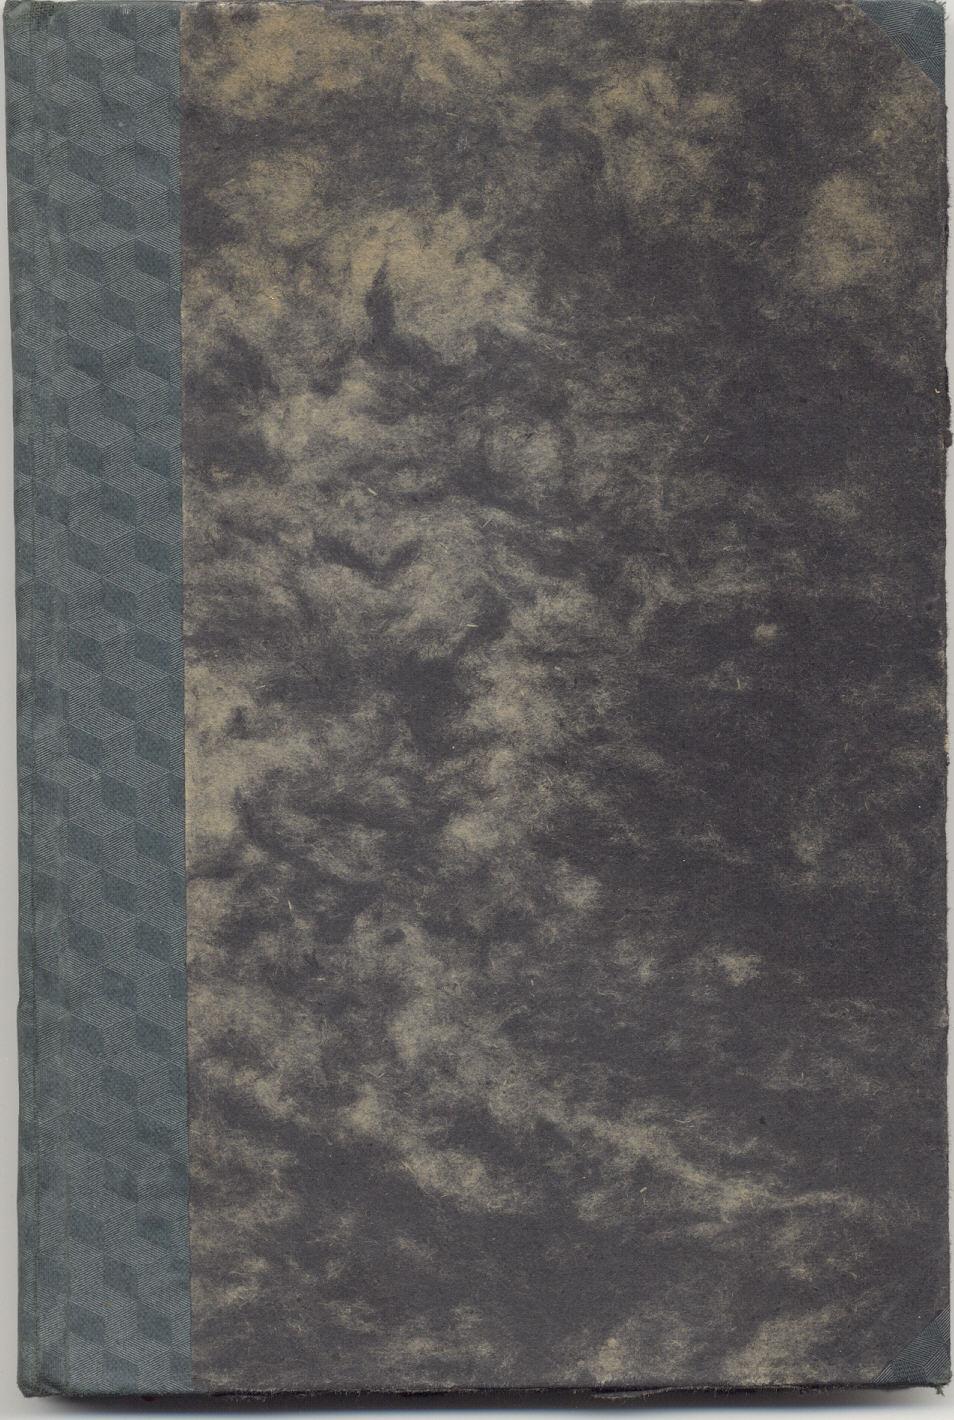 Hrdina z davu (Jimmie Higgins) - Upton Sinclair